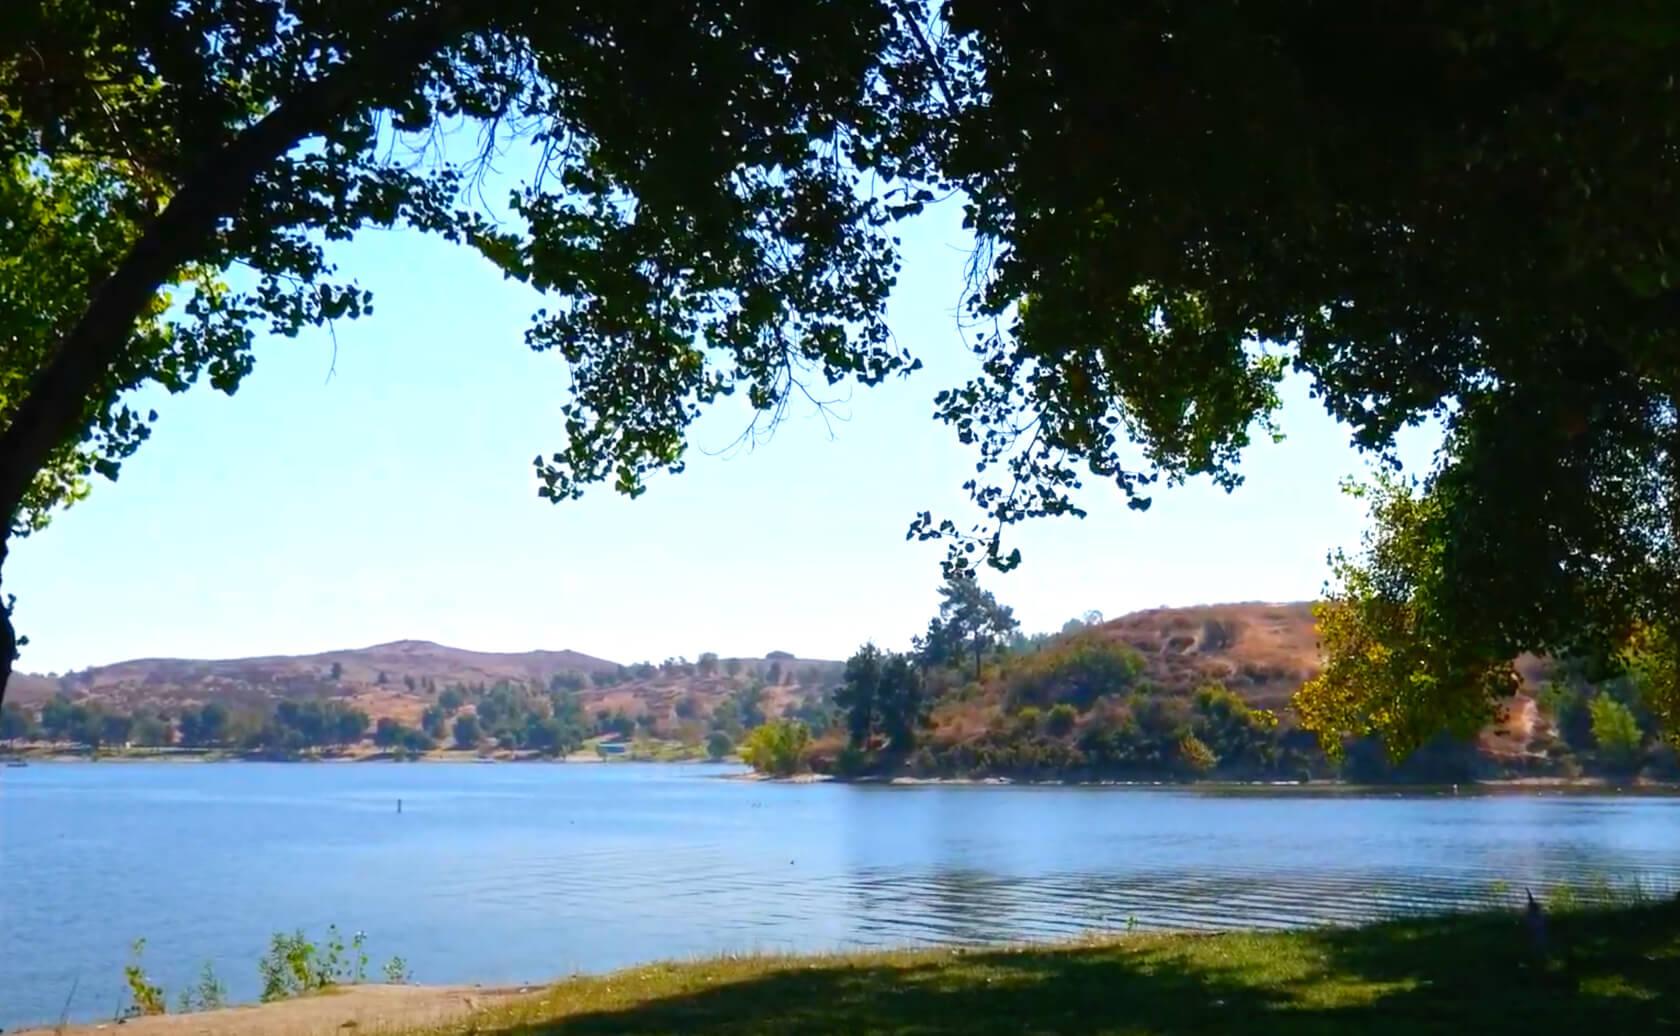 Puddingstone-Lake-Fishing-Guide-Report-California-02